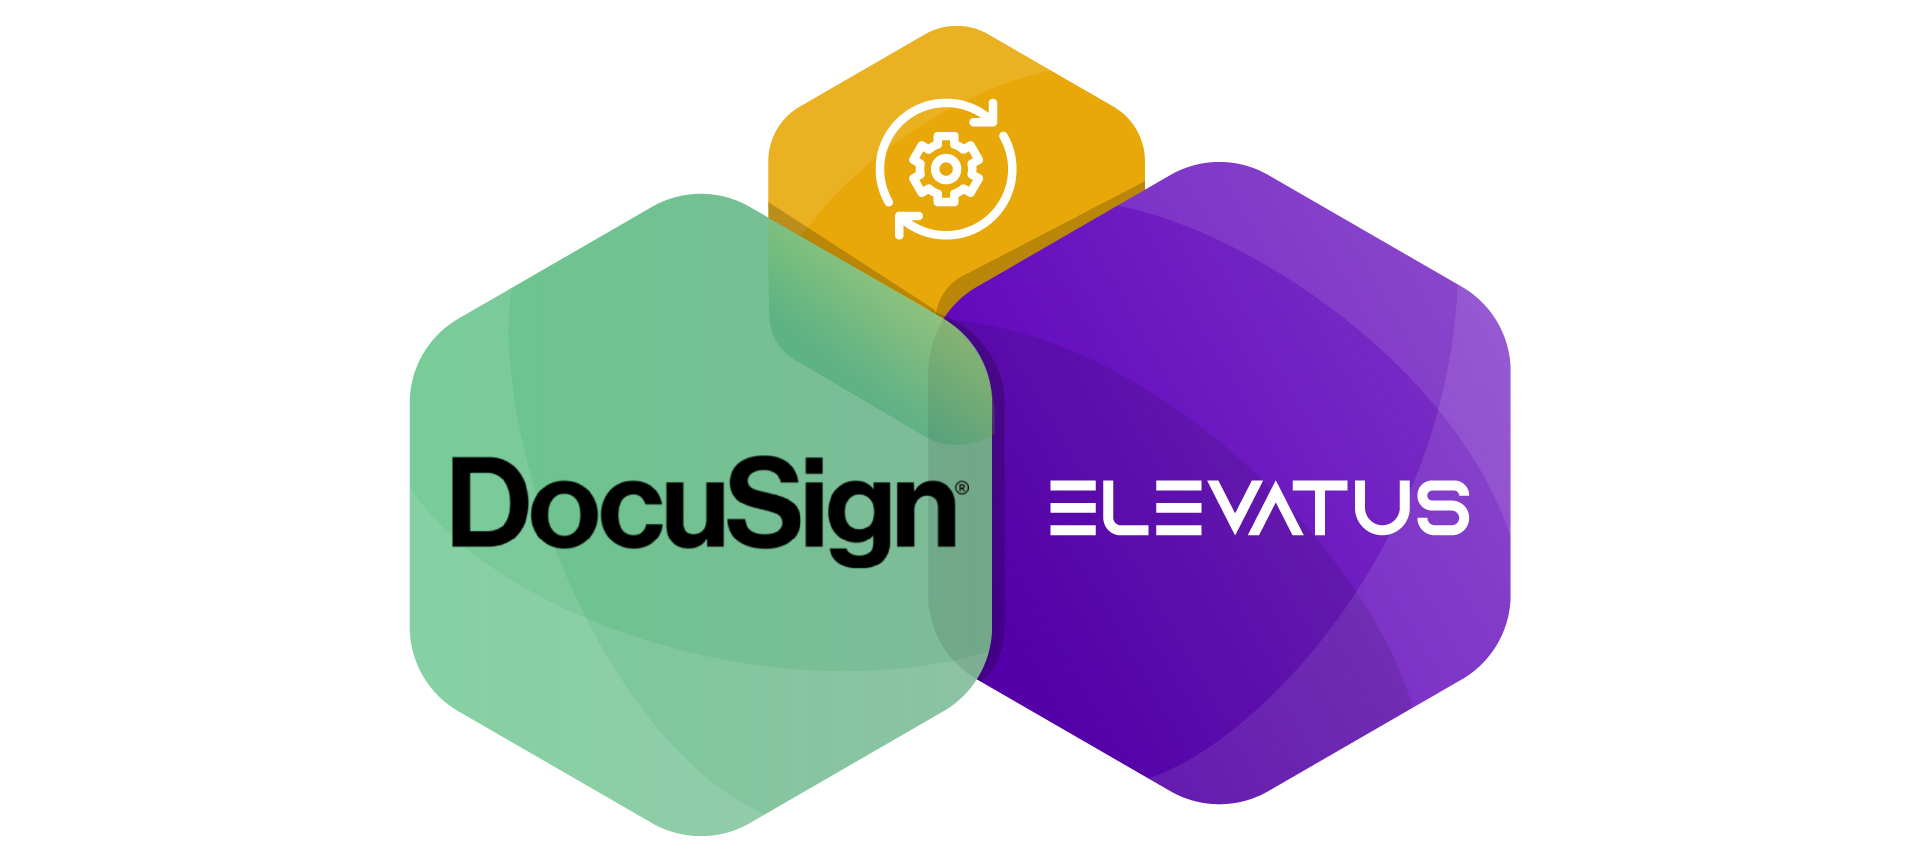 DocuSign integration